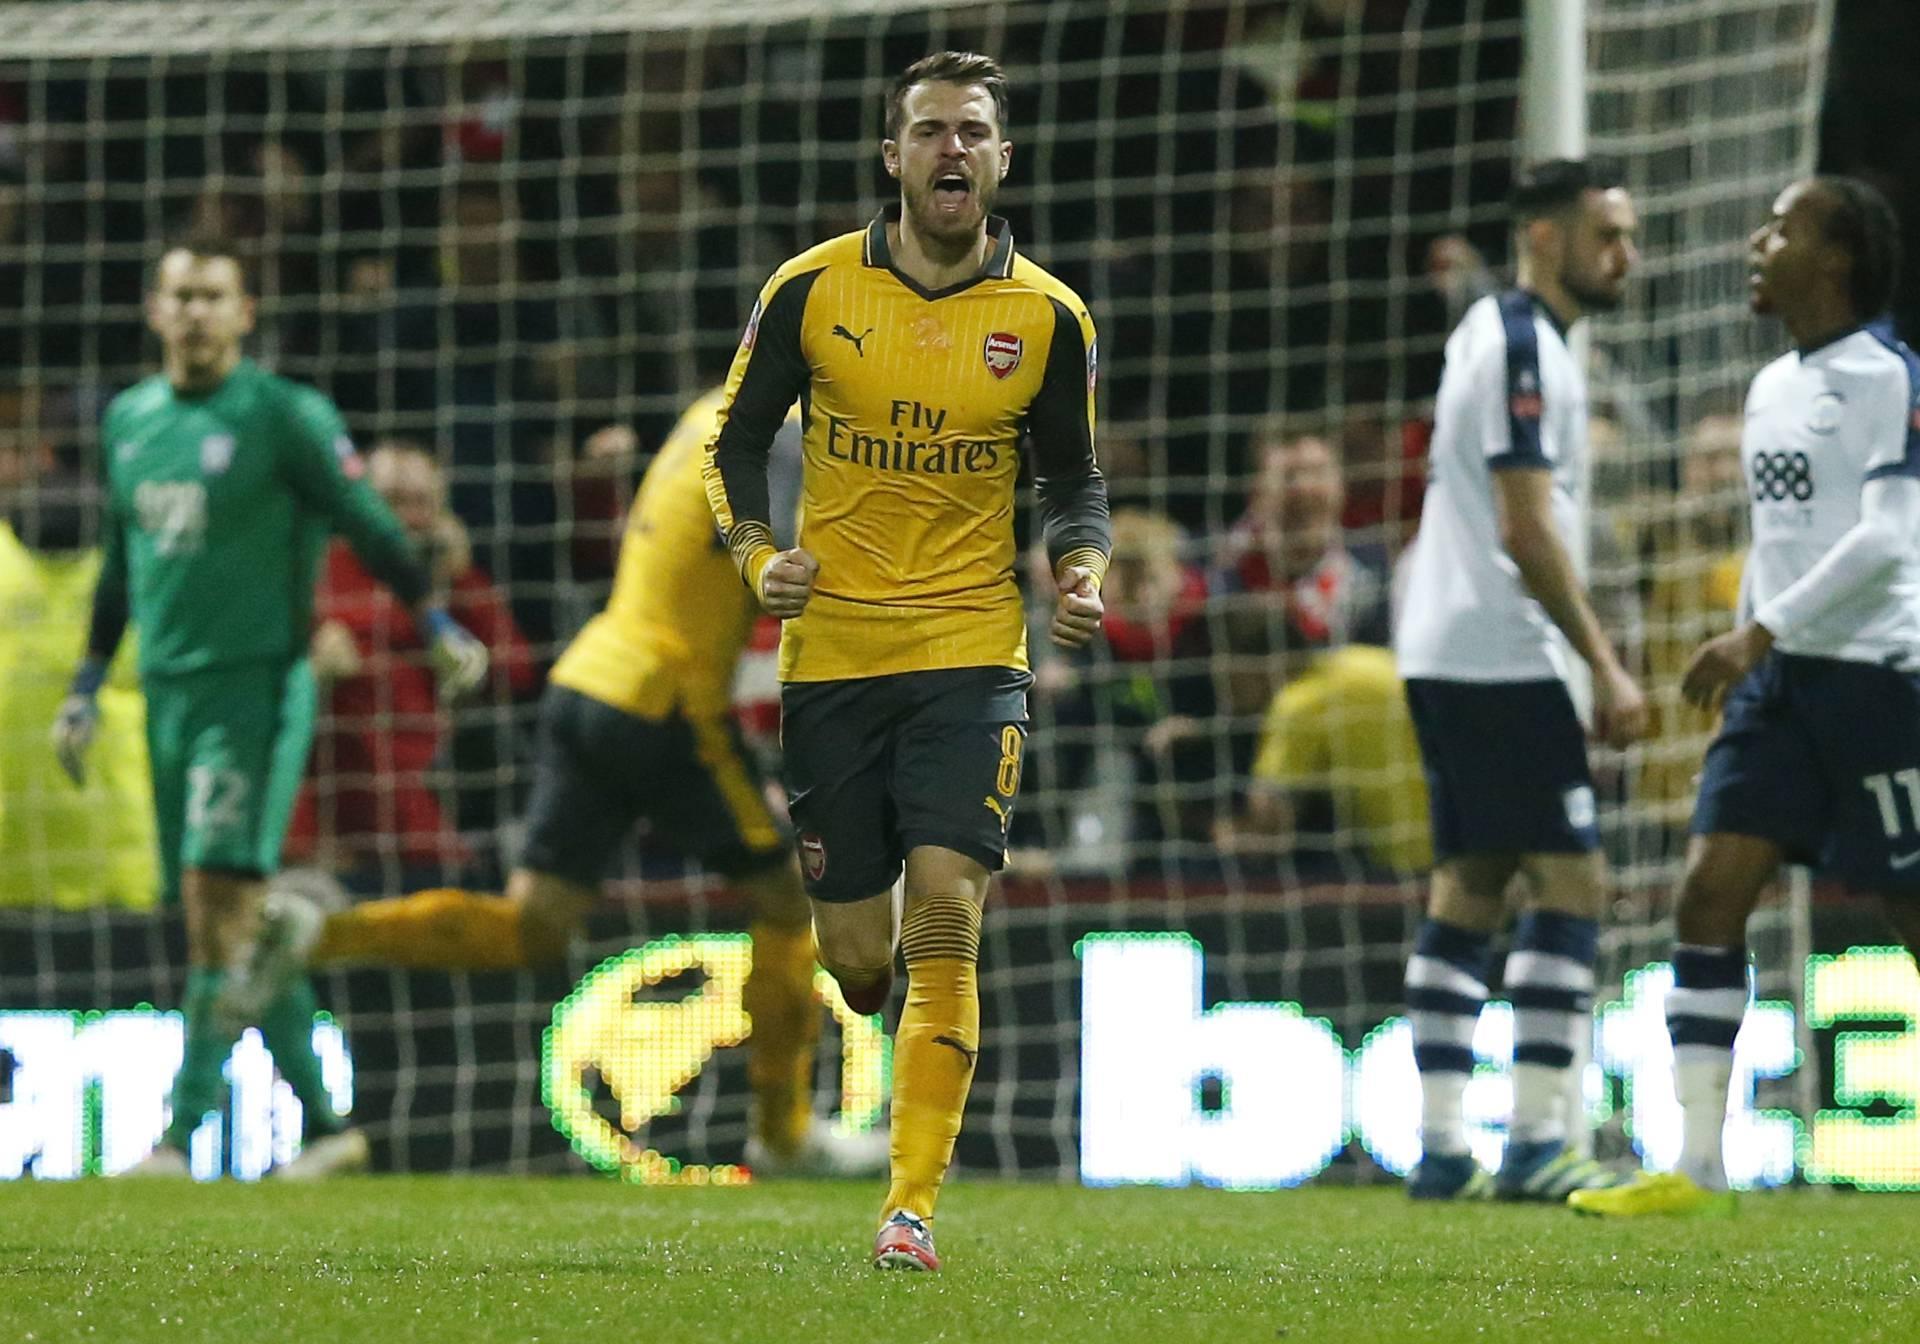 Arsenal's Aaron Ramsey celebrates scoring their first goal